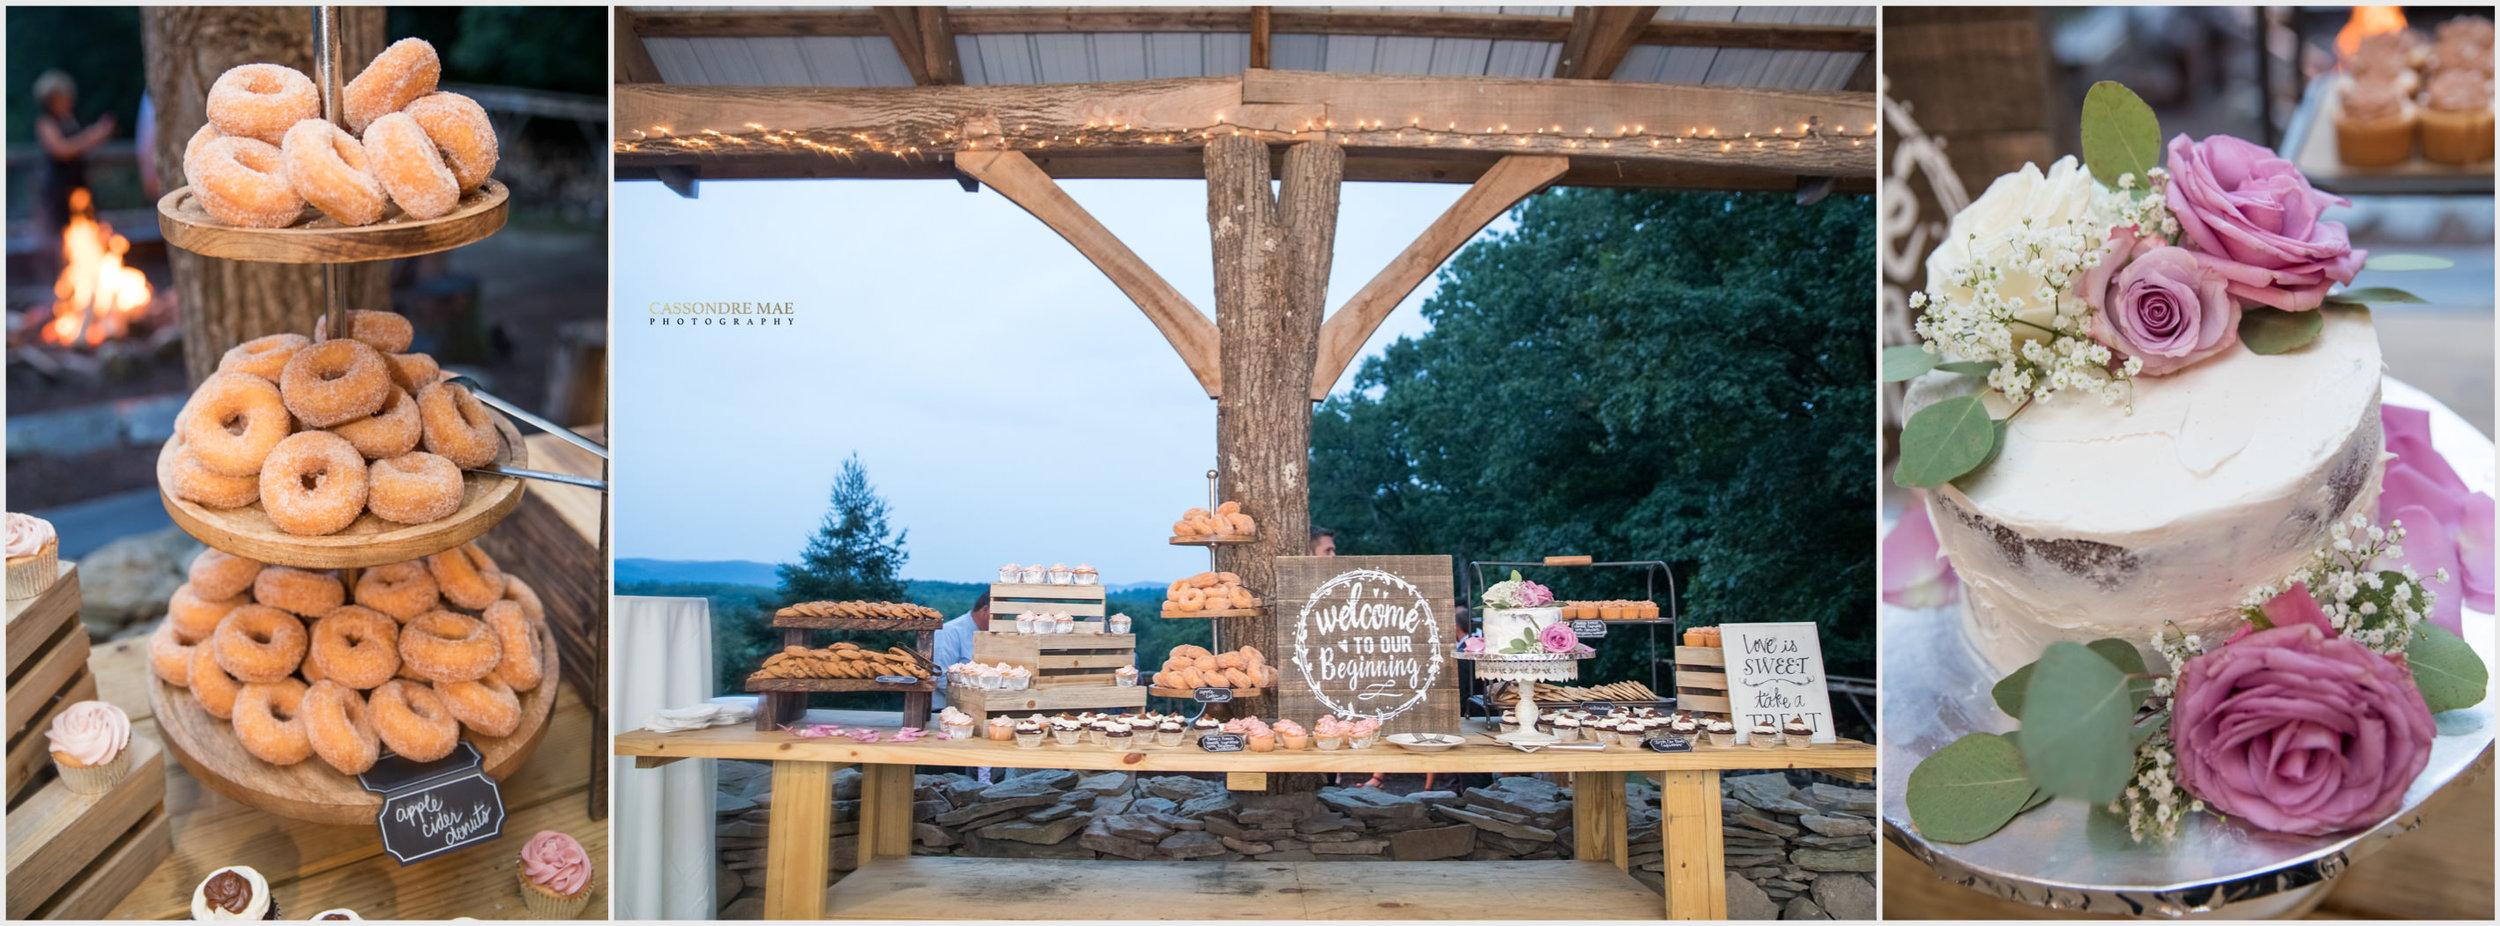 Cassondre Mae Photography Emmerich Tree Farm Wedding 7.jpg